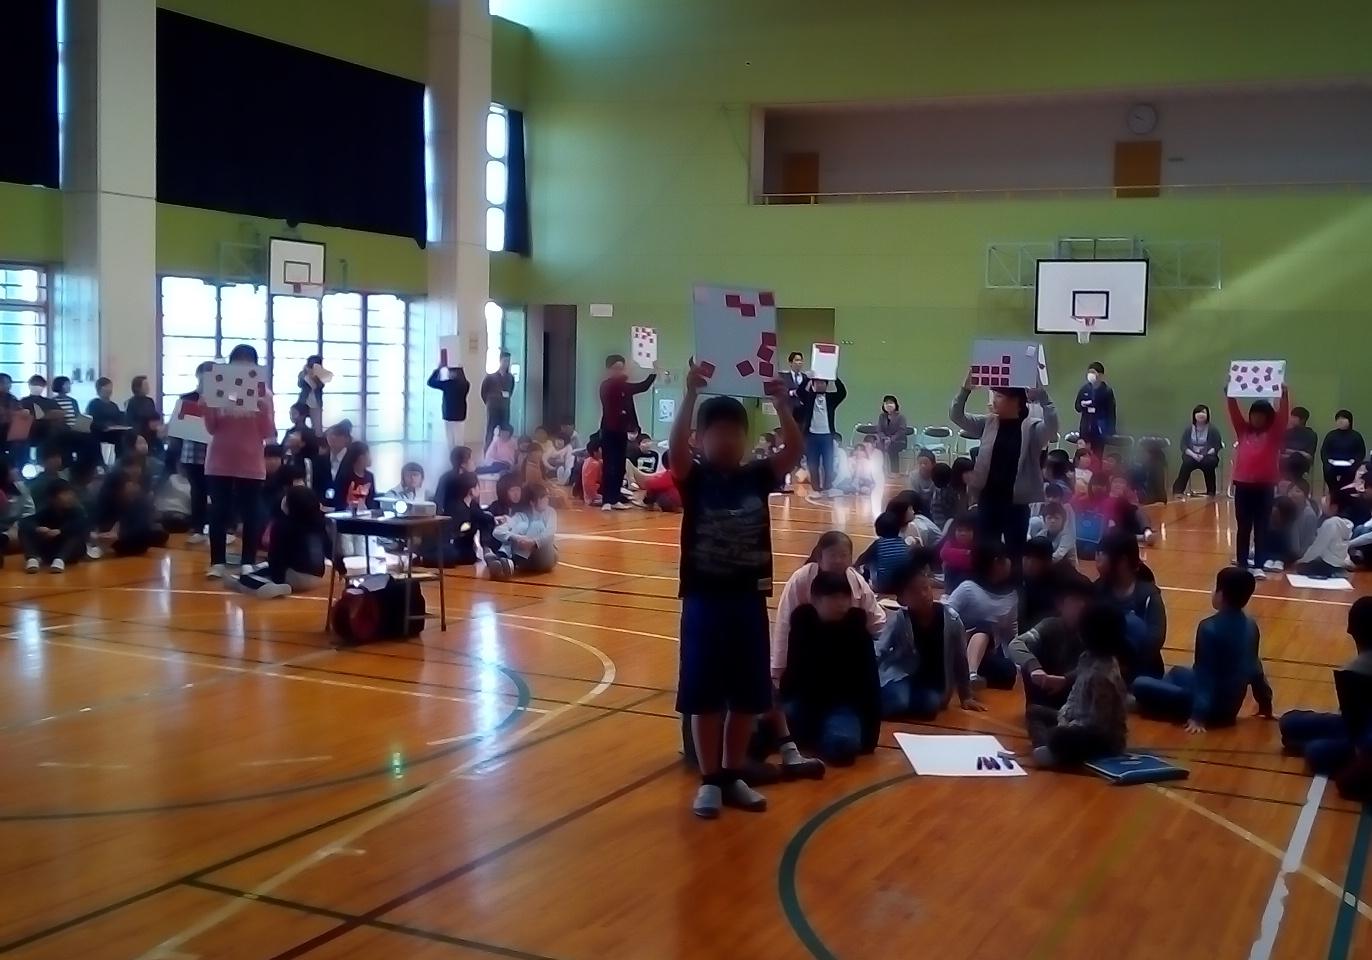 【新潟市立漆山小学校】雷・暴風・竜巻に関する学習